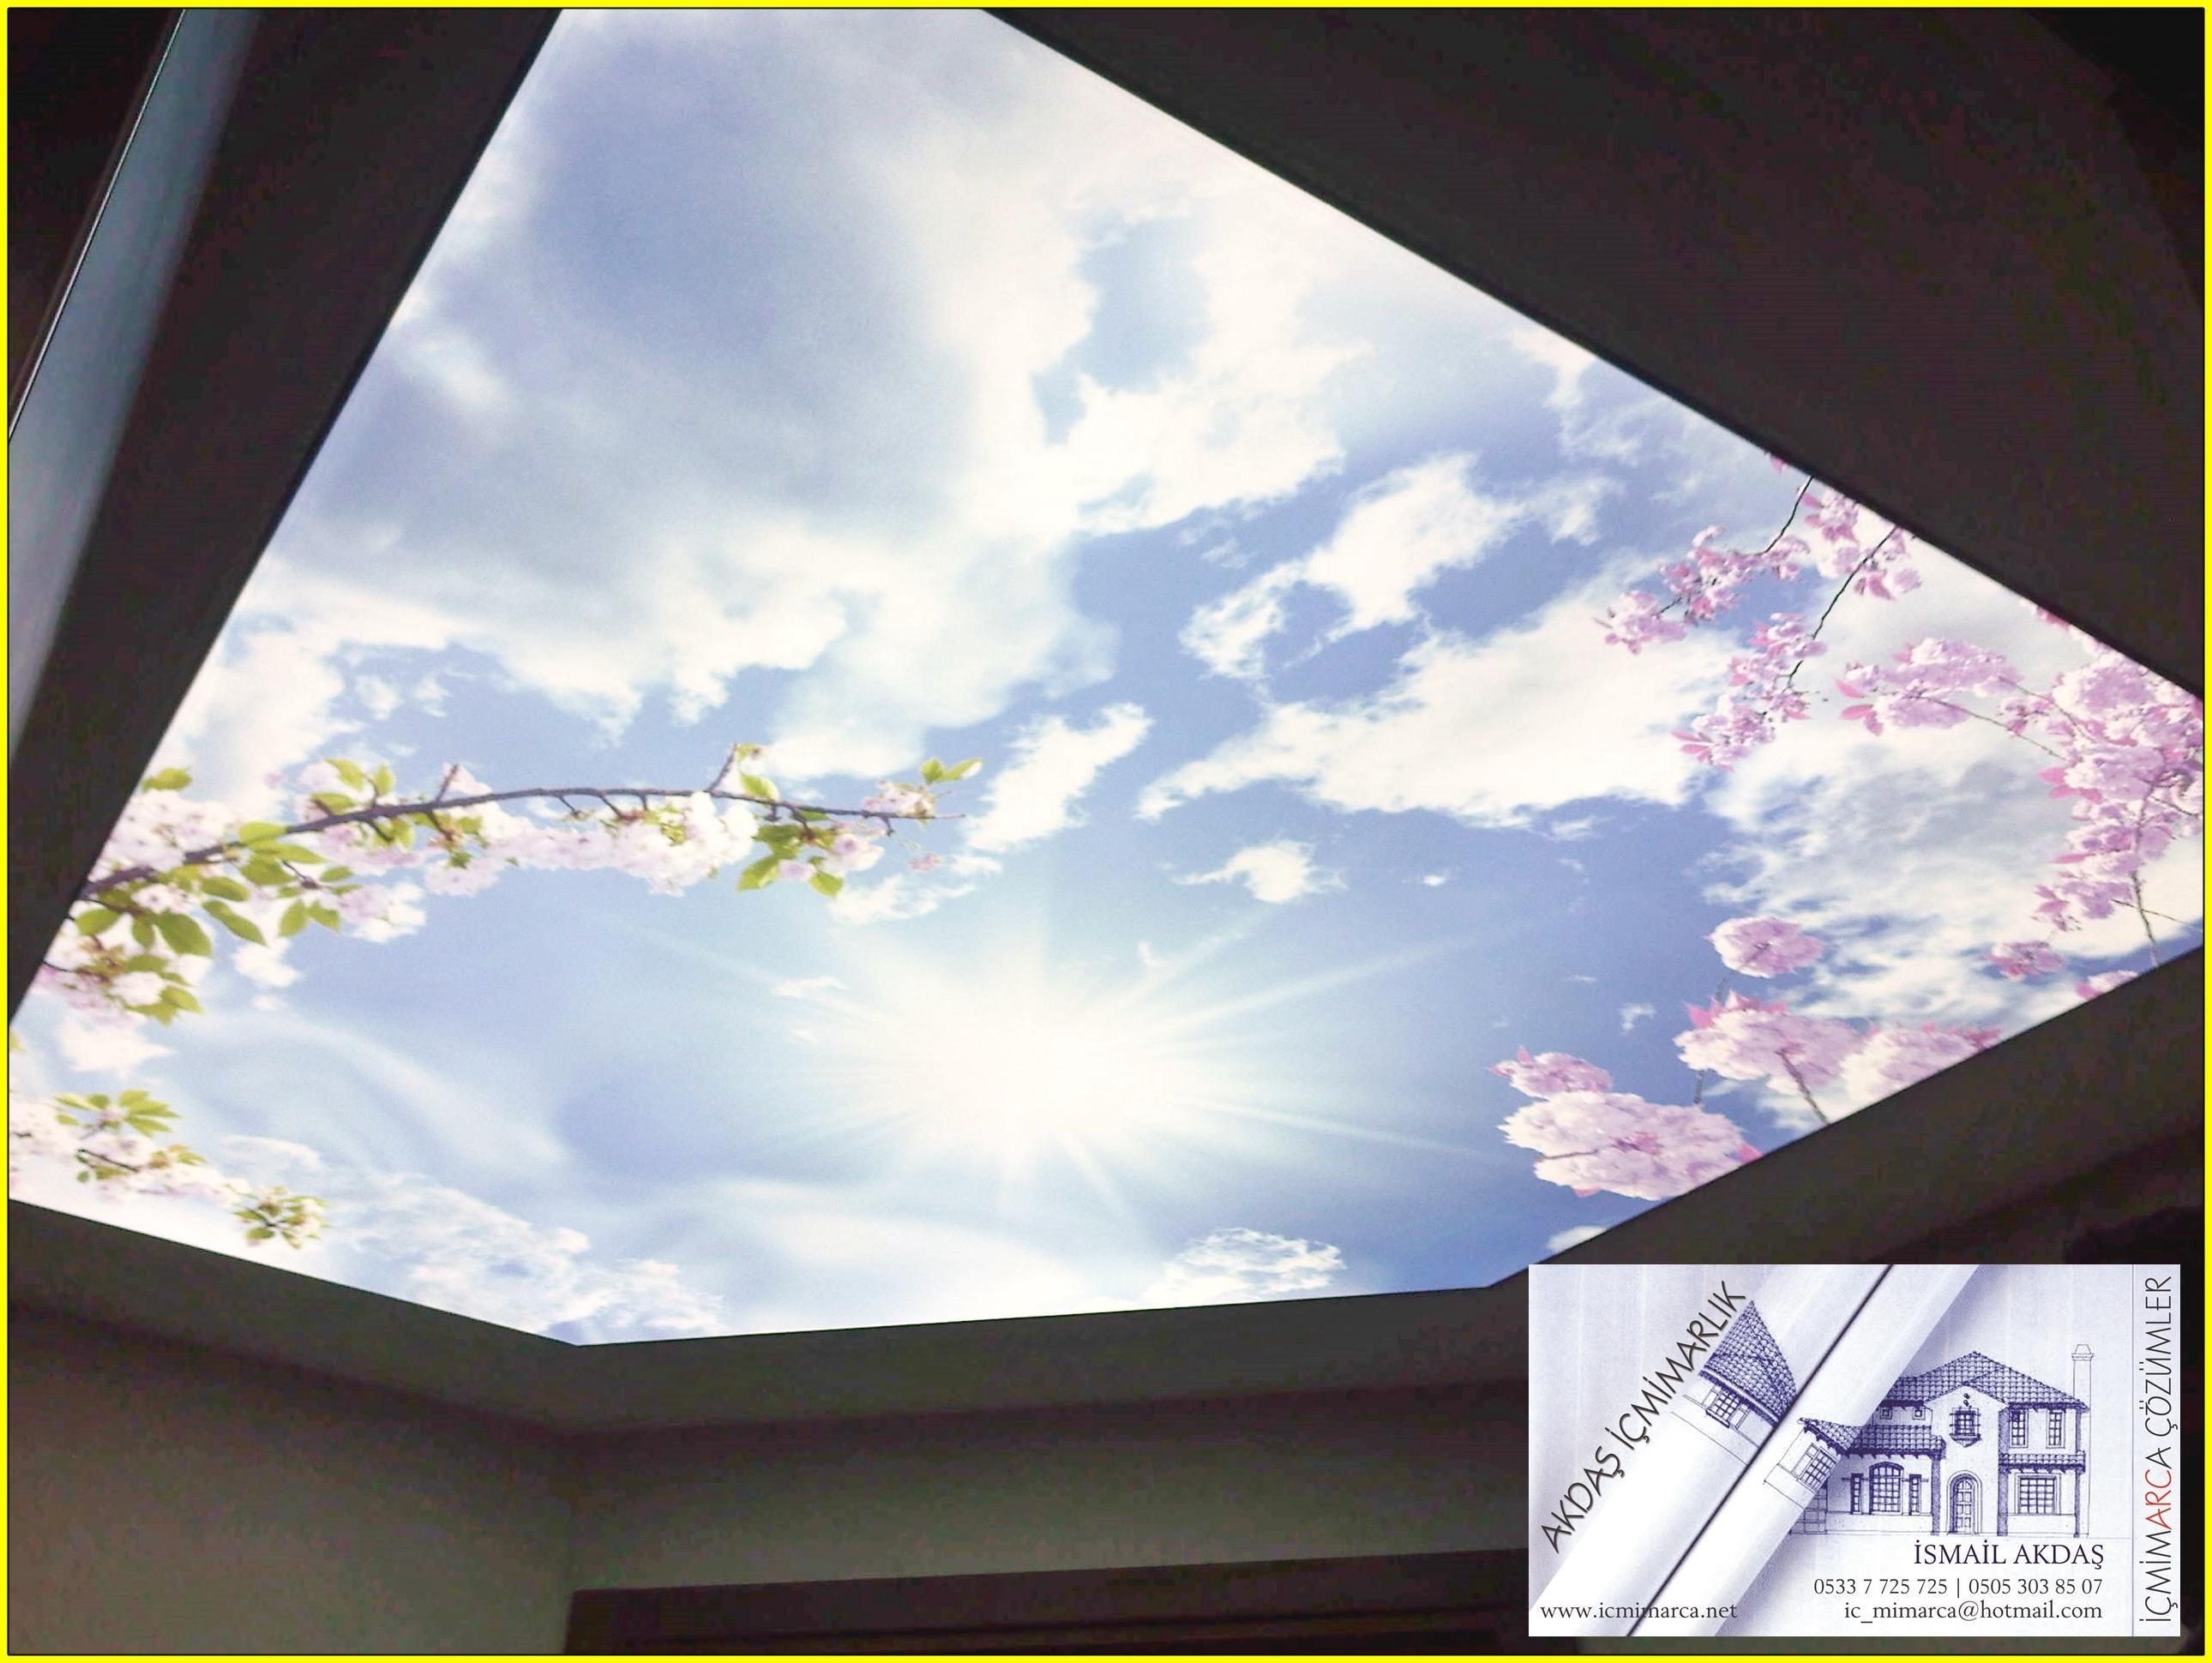 Related pictures gergi tavan barrisol barisol modelleri pictures to - Gergi Tavan Modelleri